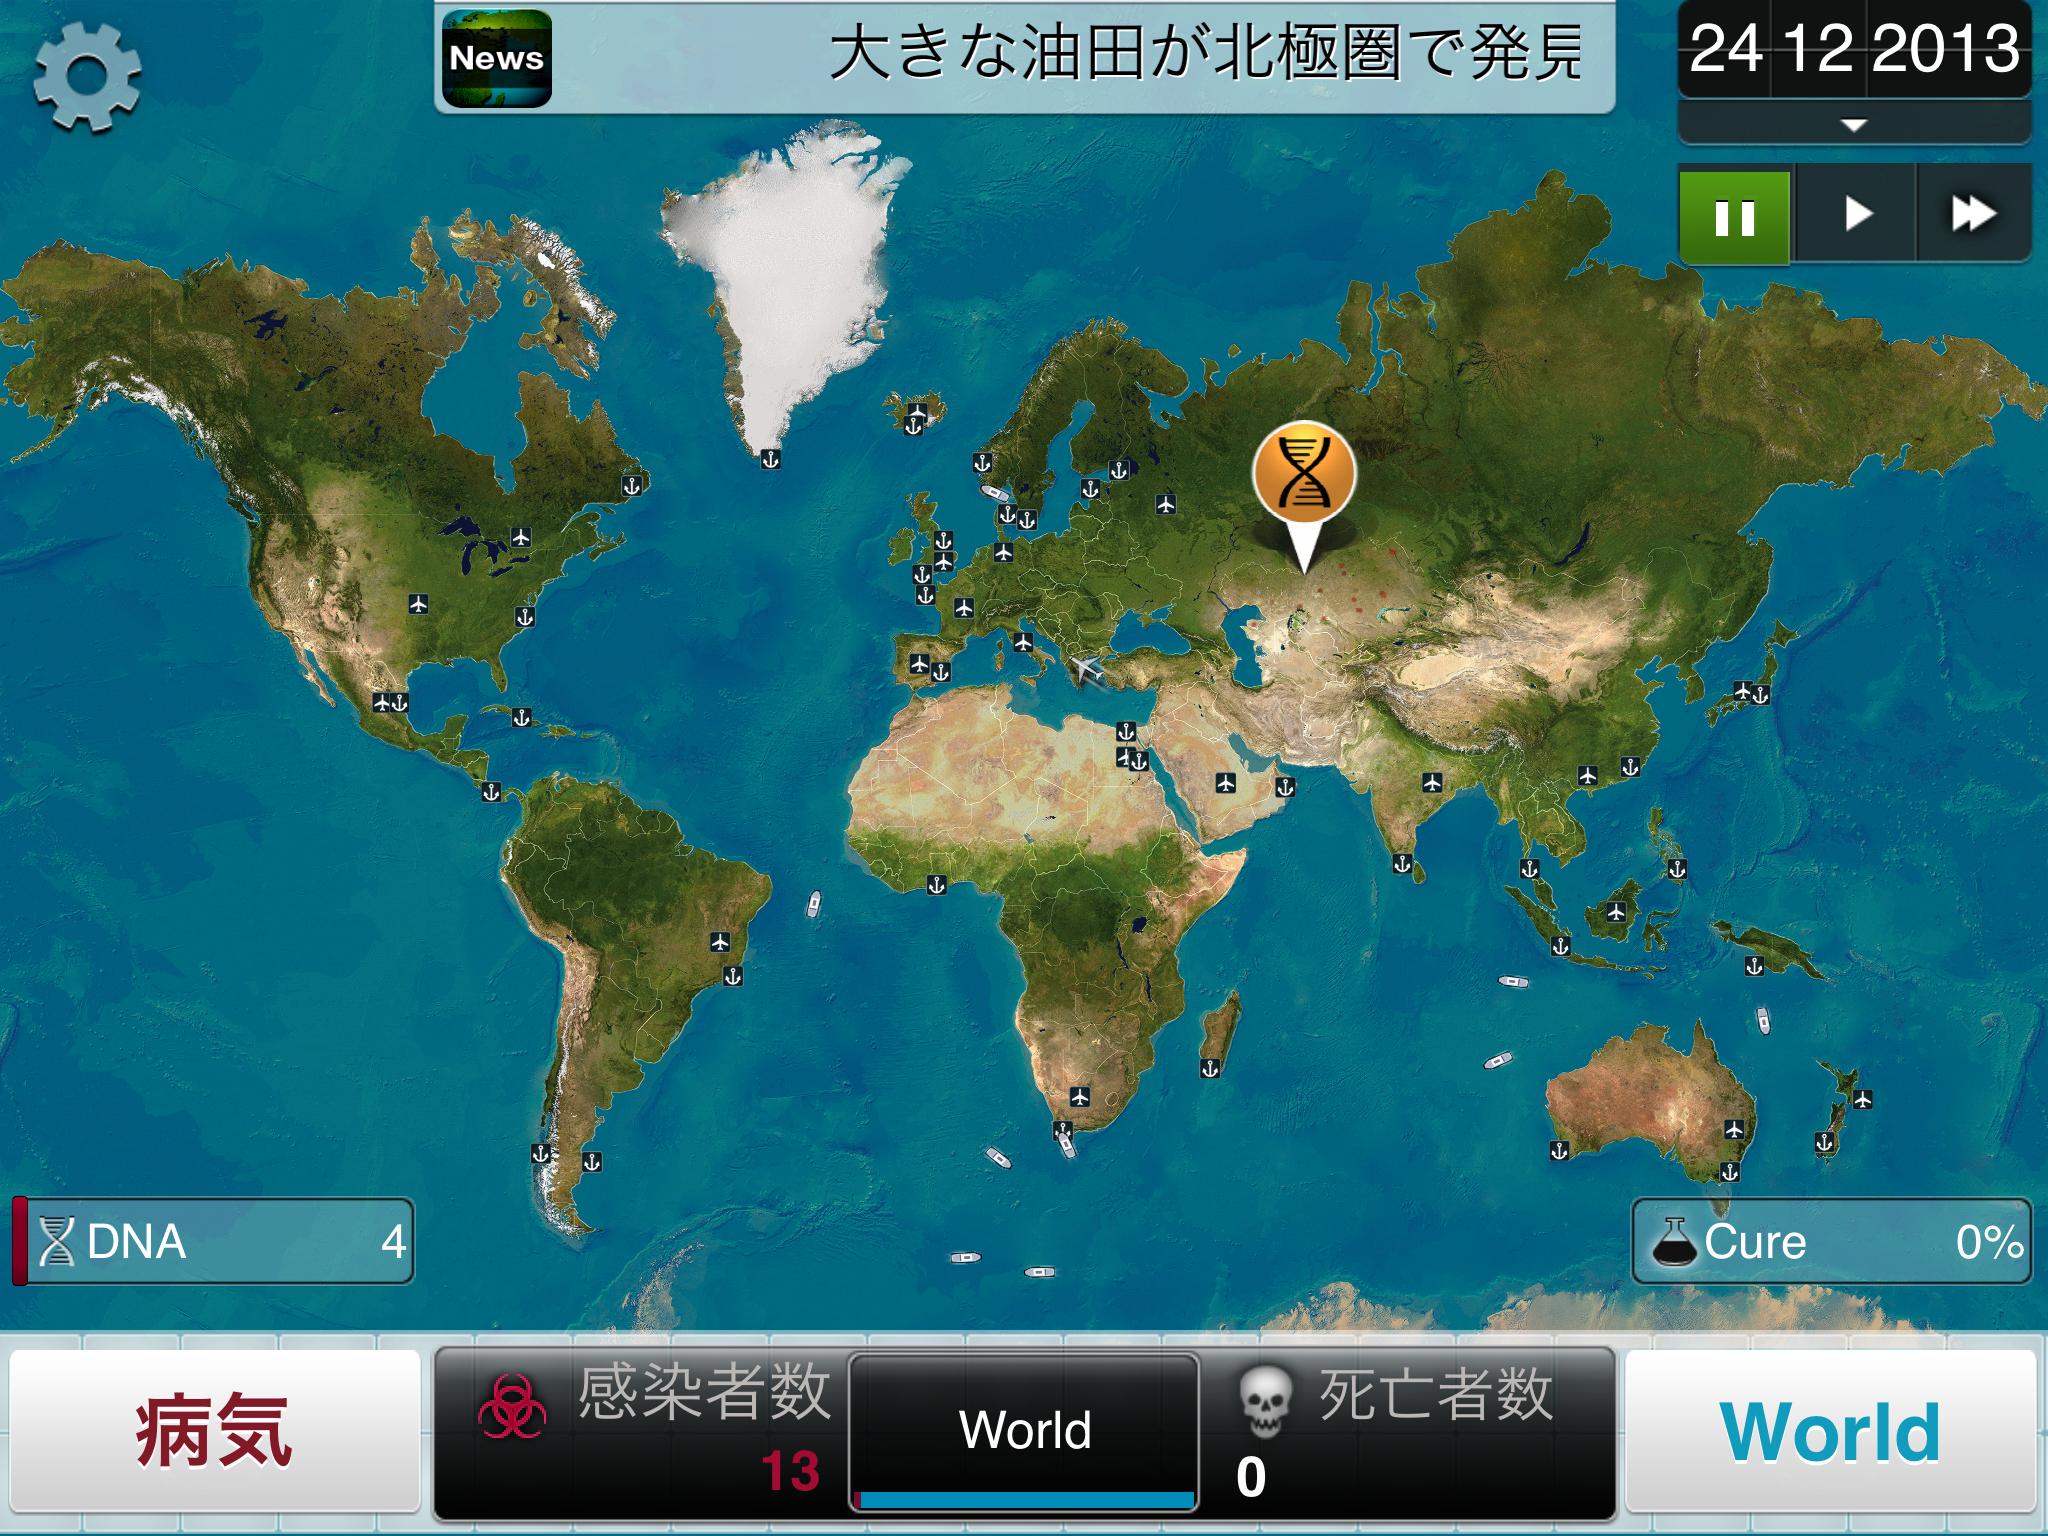 Plague Inc. -伝染病株式会社-:あなたはどこまで世界を制覇できますか?